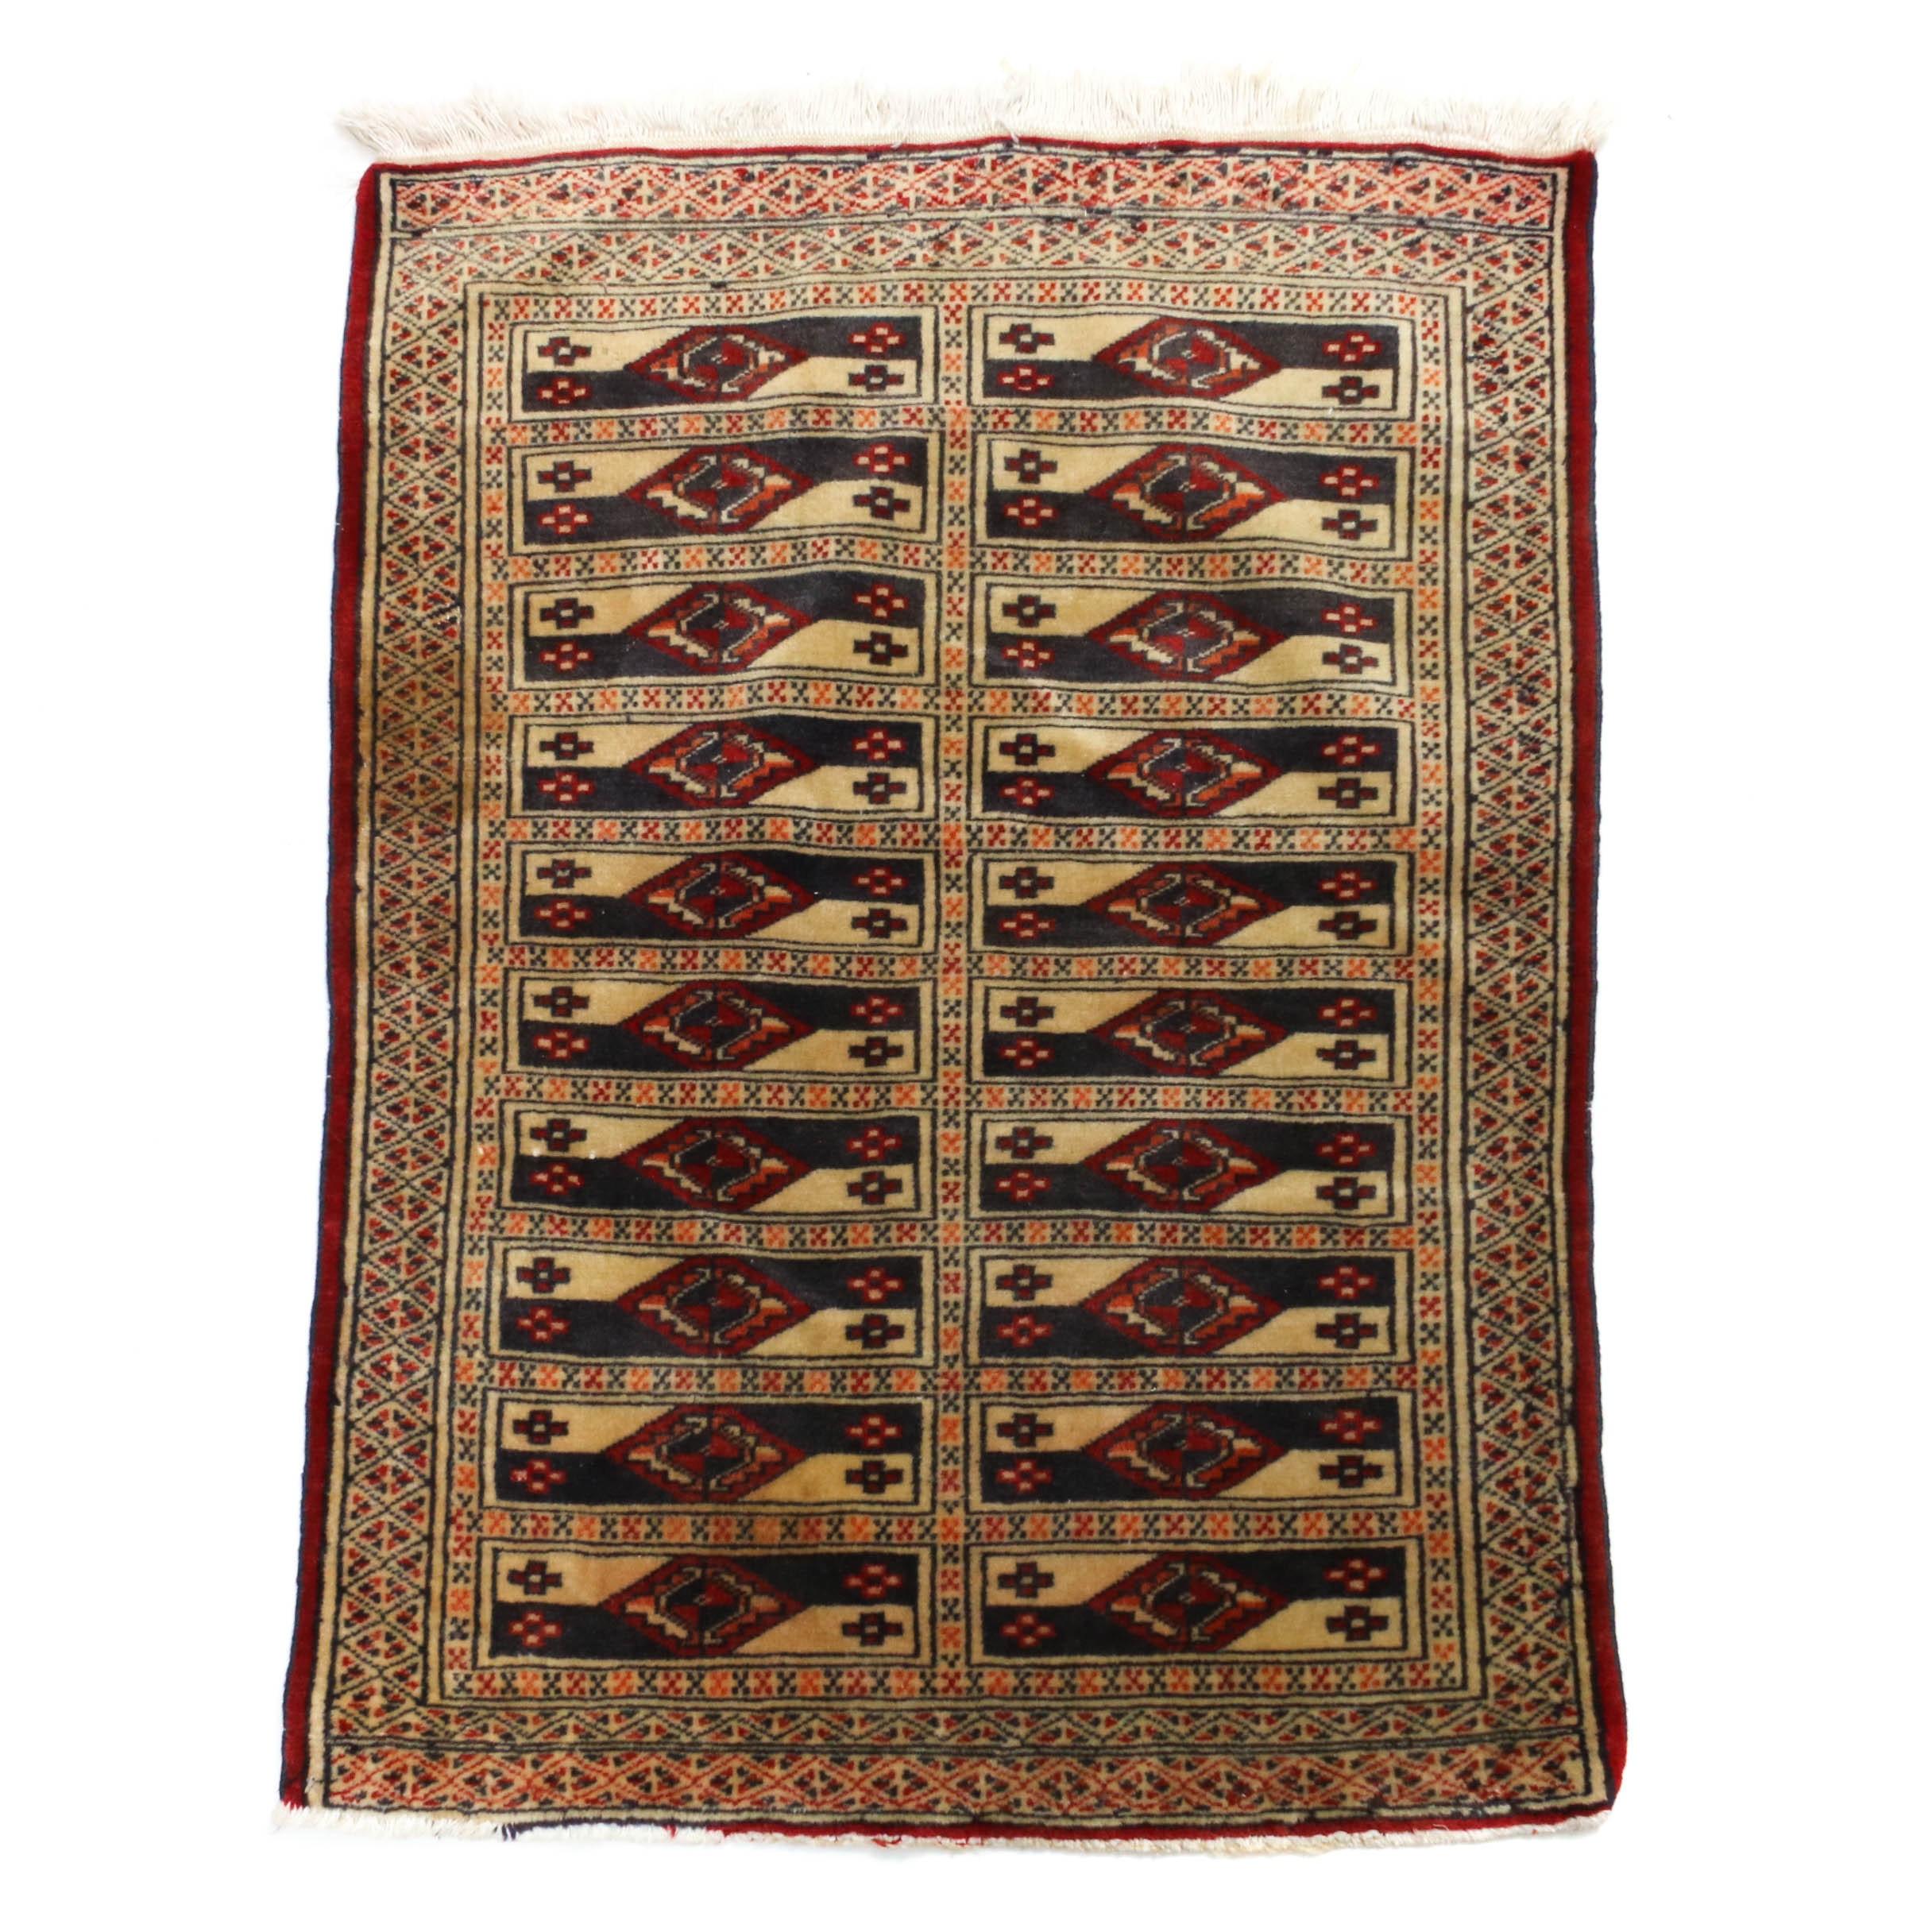 2'3 x 3'3 Hand-Knotted Persian Turkoman Wool Rug, Circa 1930